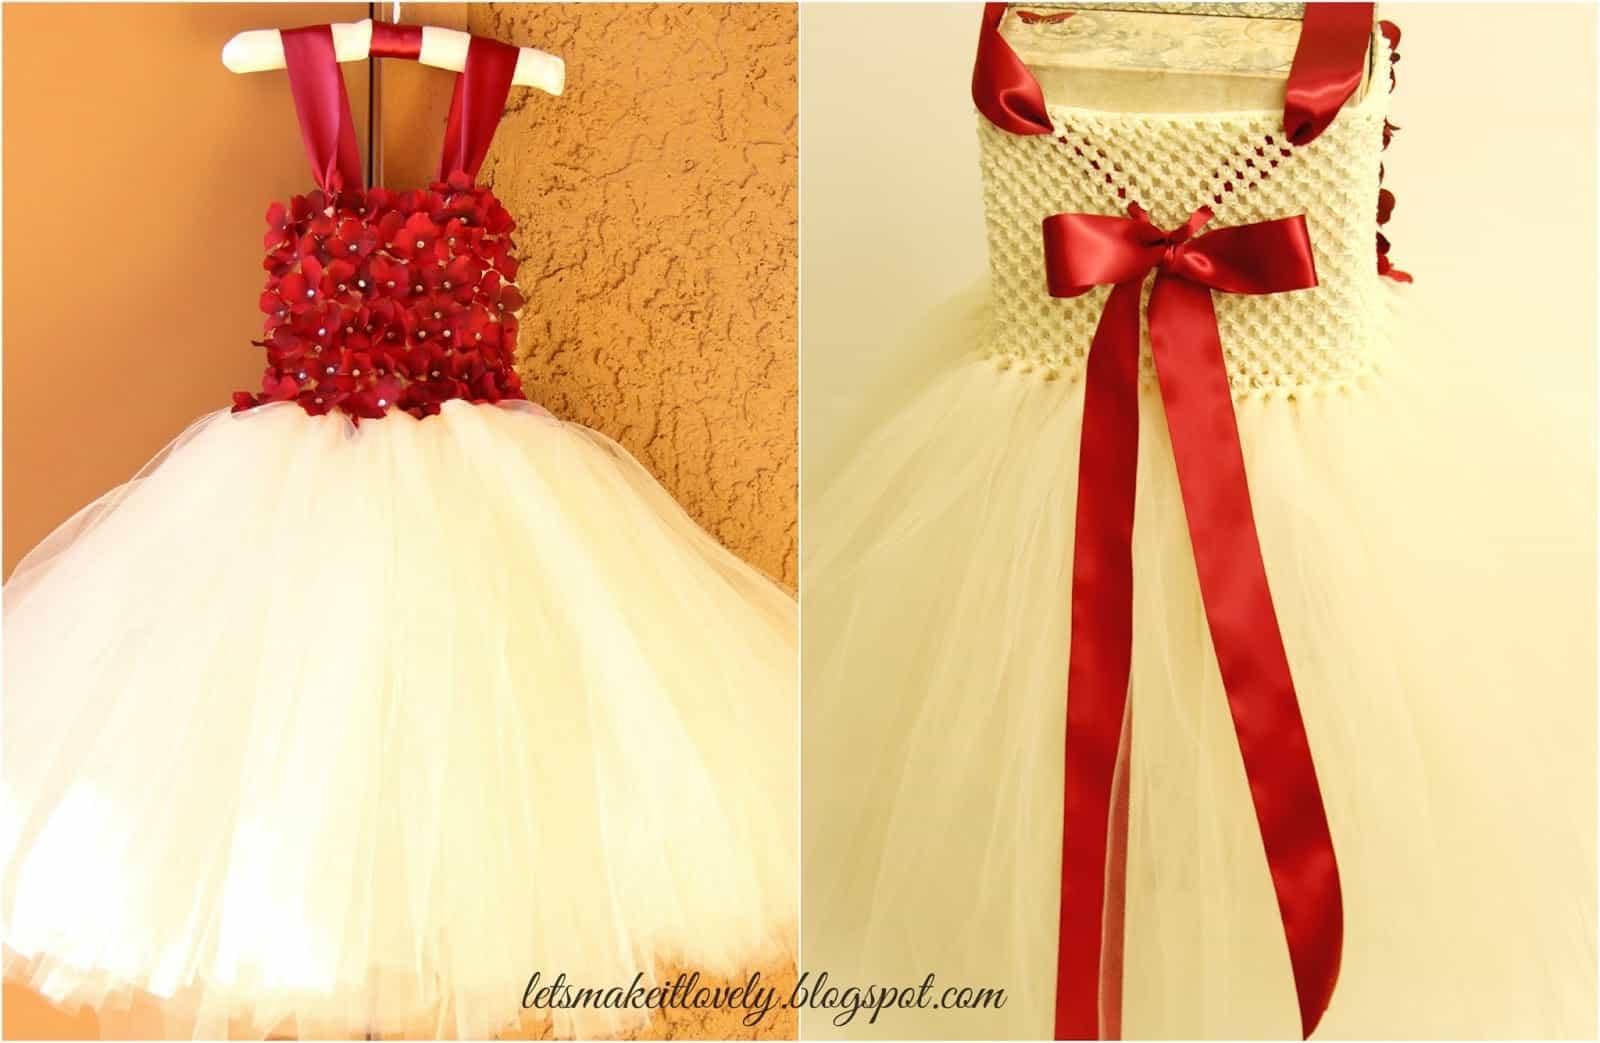 Simply adorable 15 easy to craft diy tutu designs 11 floral topped tutu dress solutioingenieria Choice Image